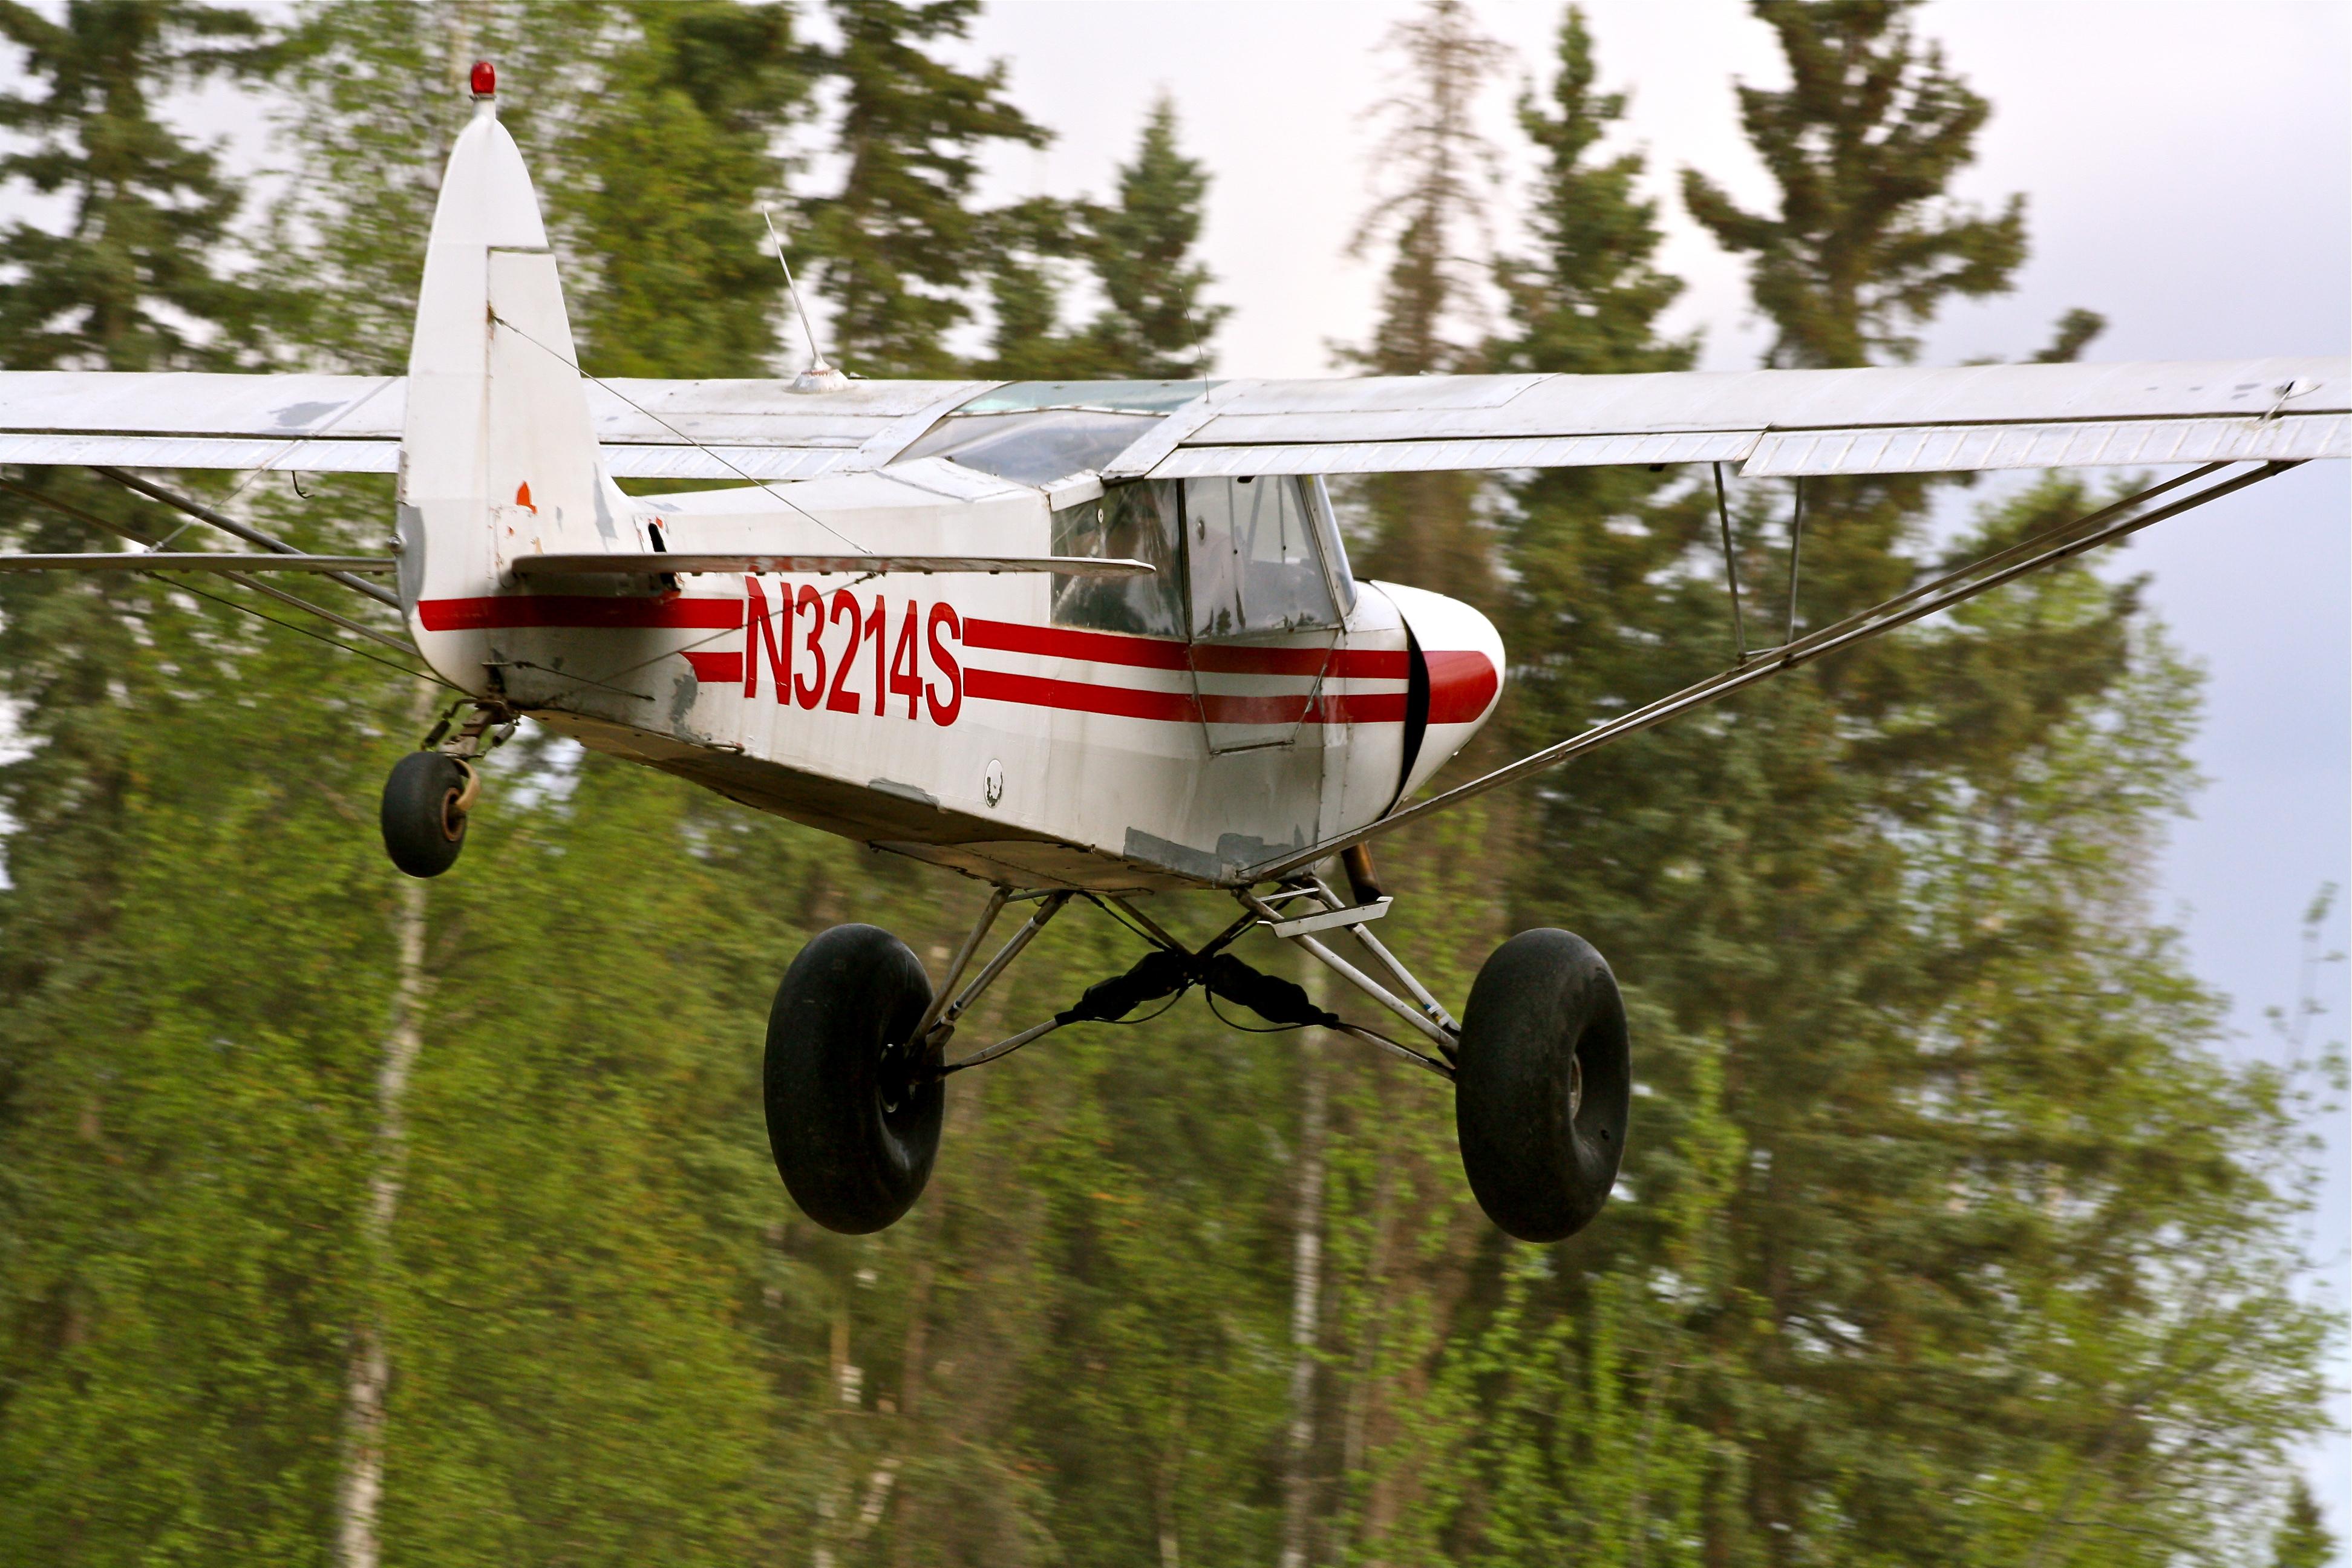 Alaskan Bush Pilot Freephotosforeveryone